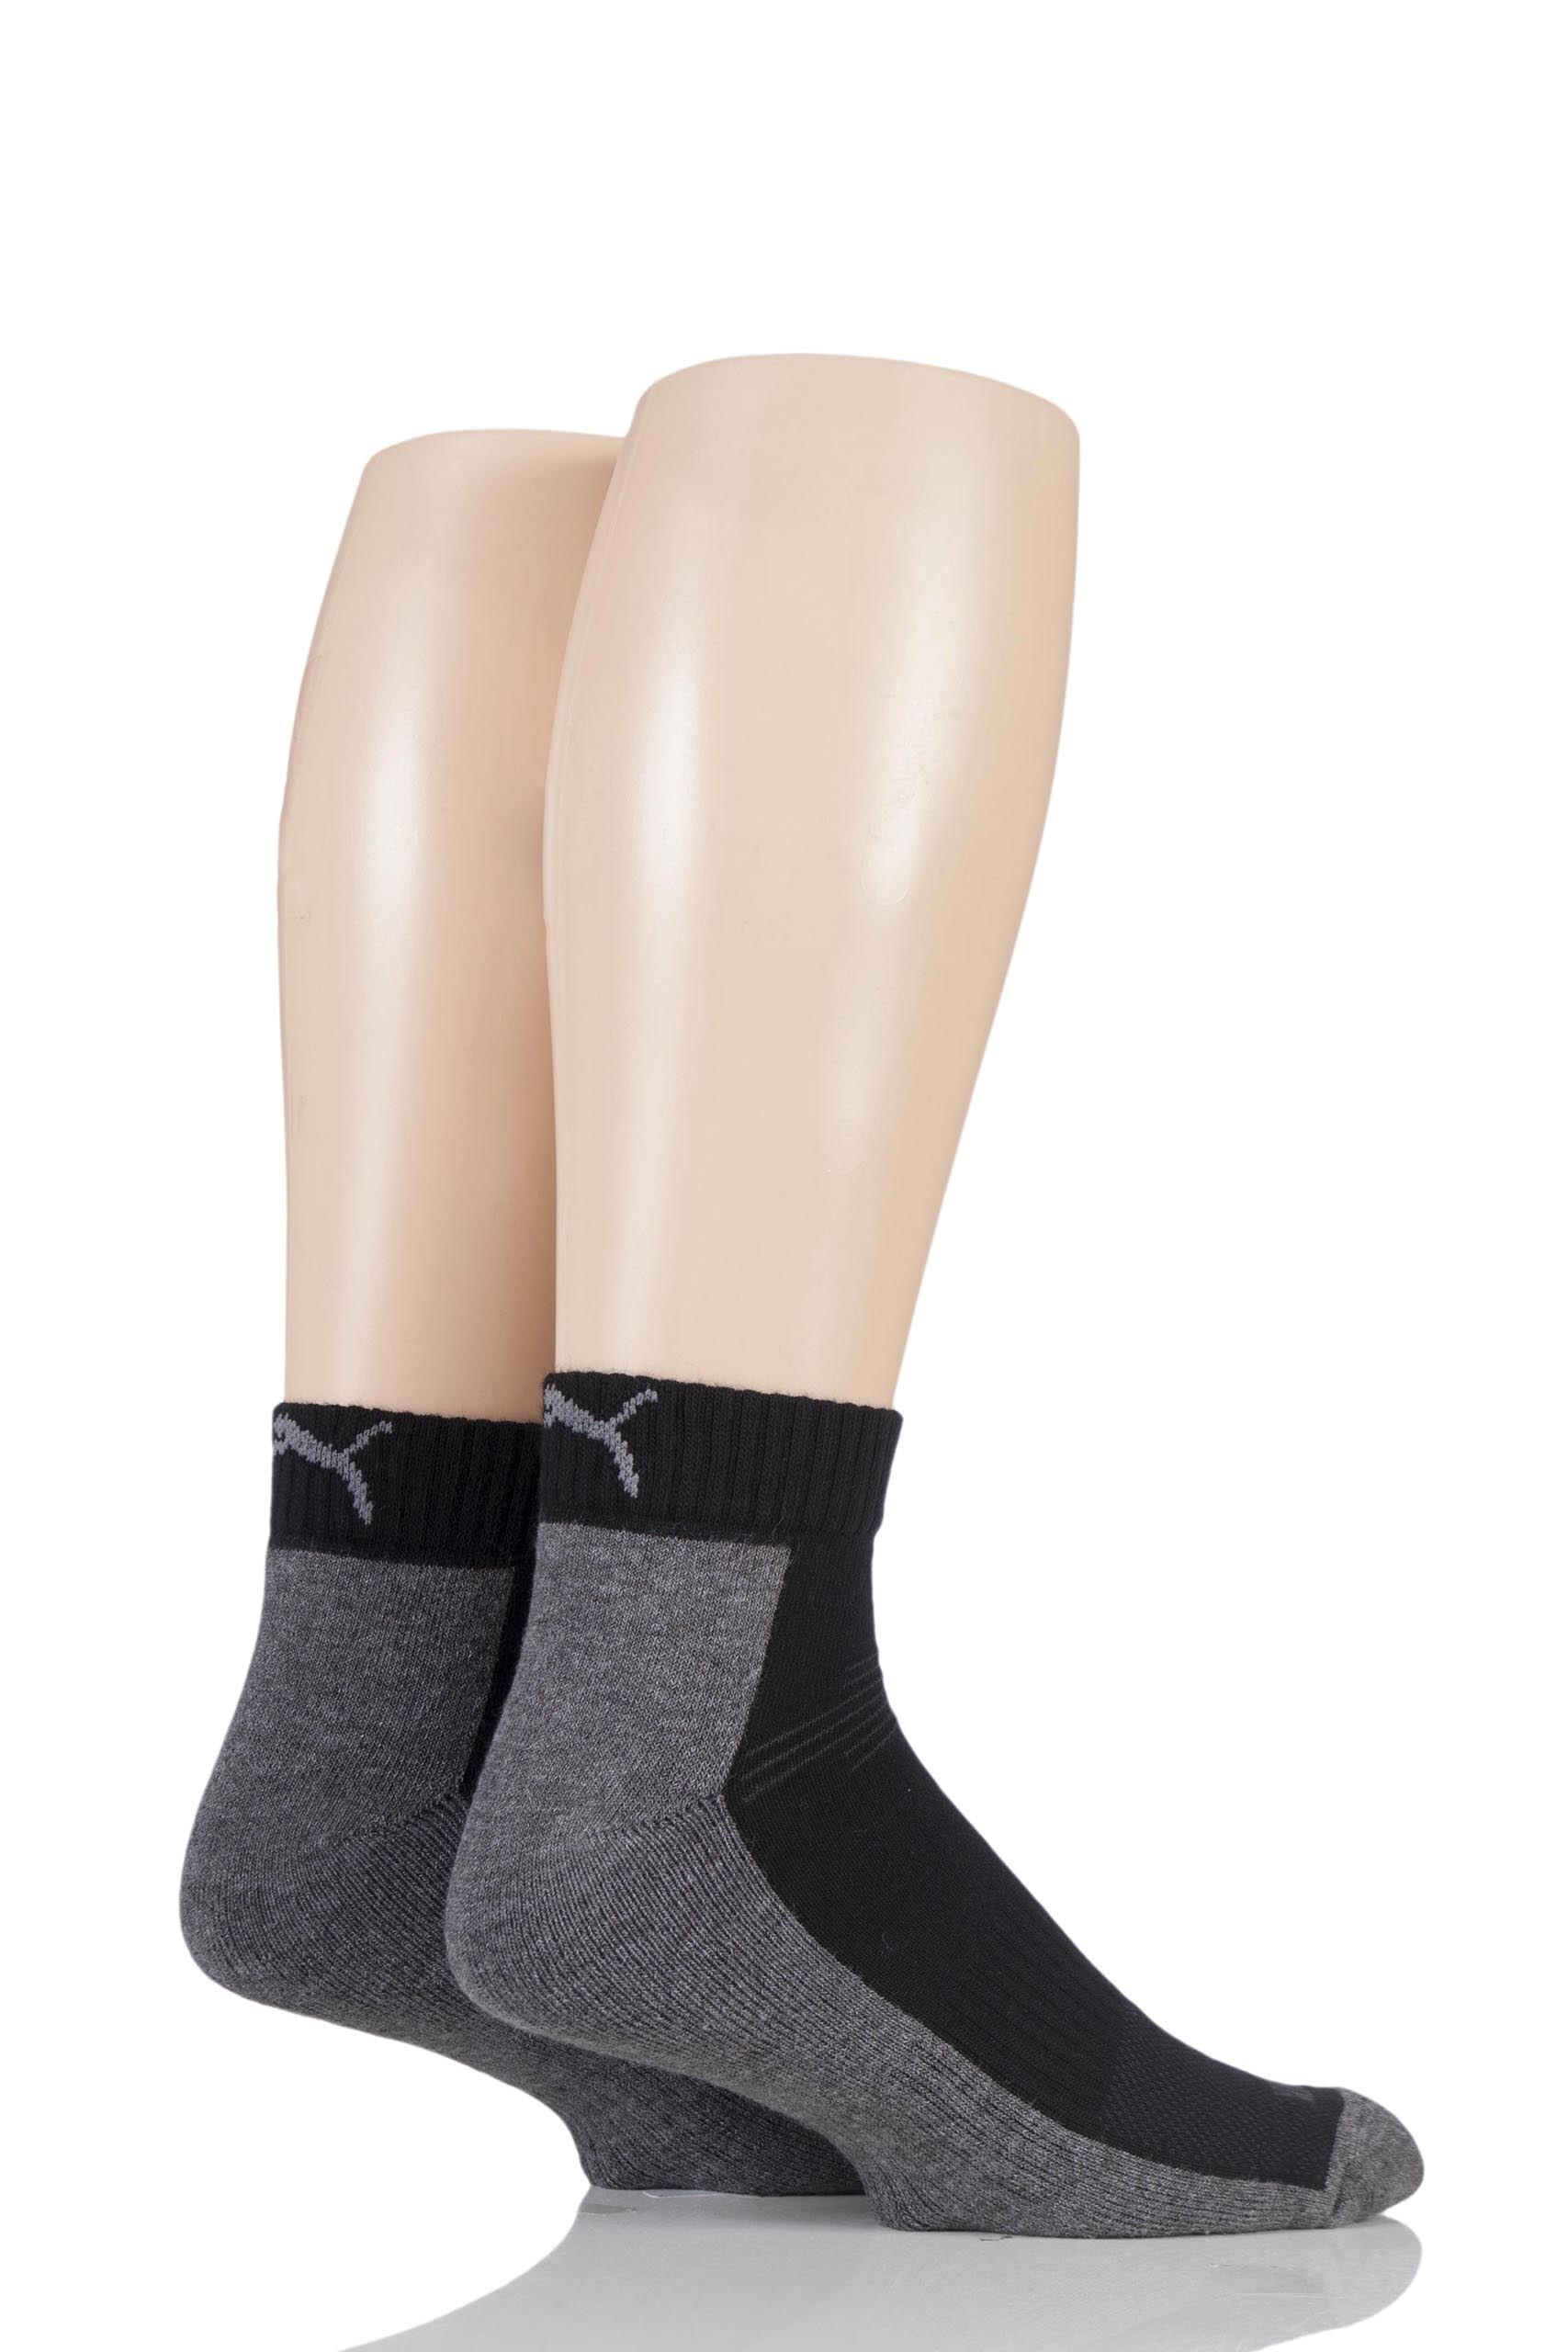 Image of 2 Pair Grey Coolmax Technical Quarter Length Socks Unisex 6-8.5 Unisex - Puma